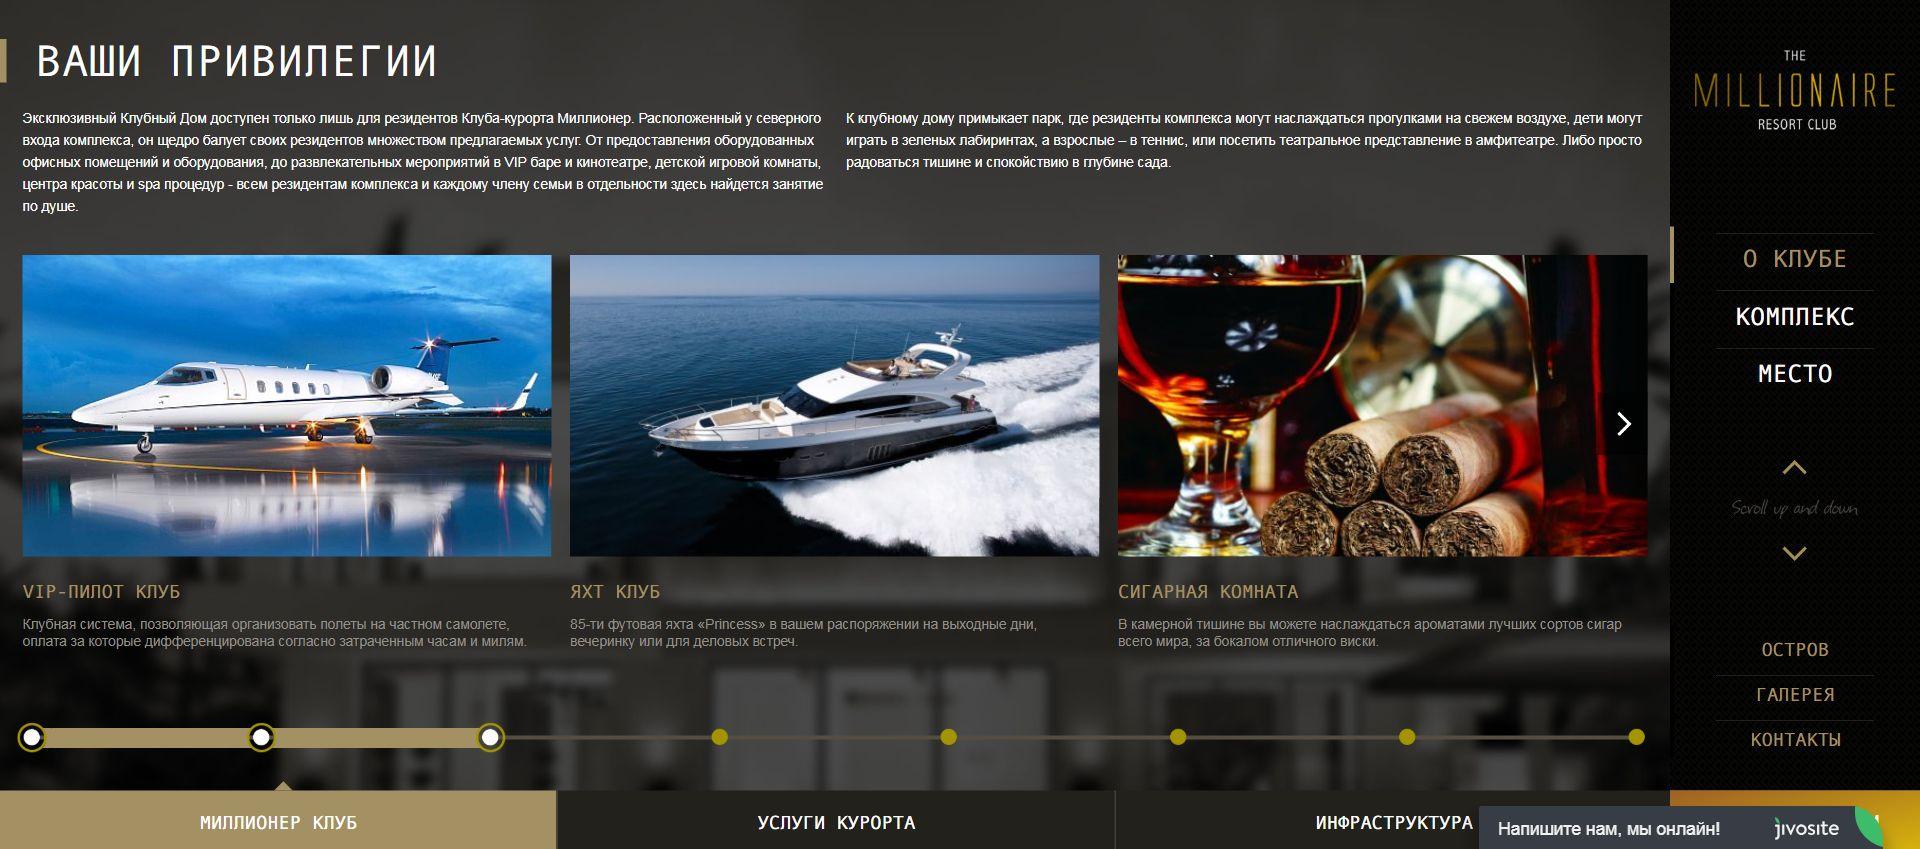 Пример сайта Миллионер